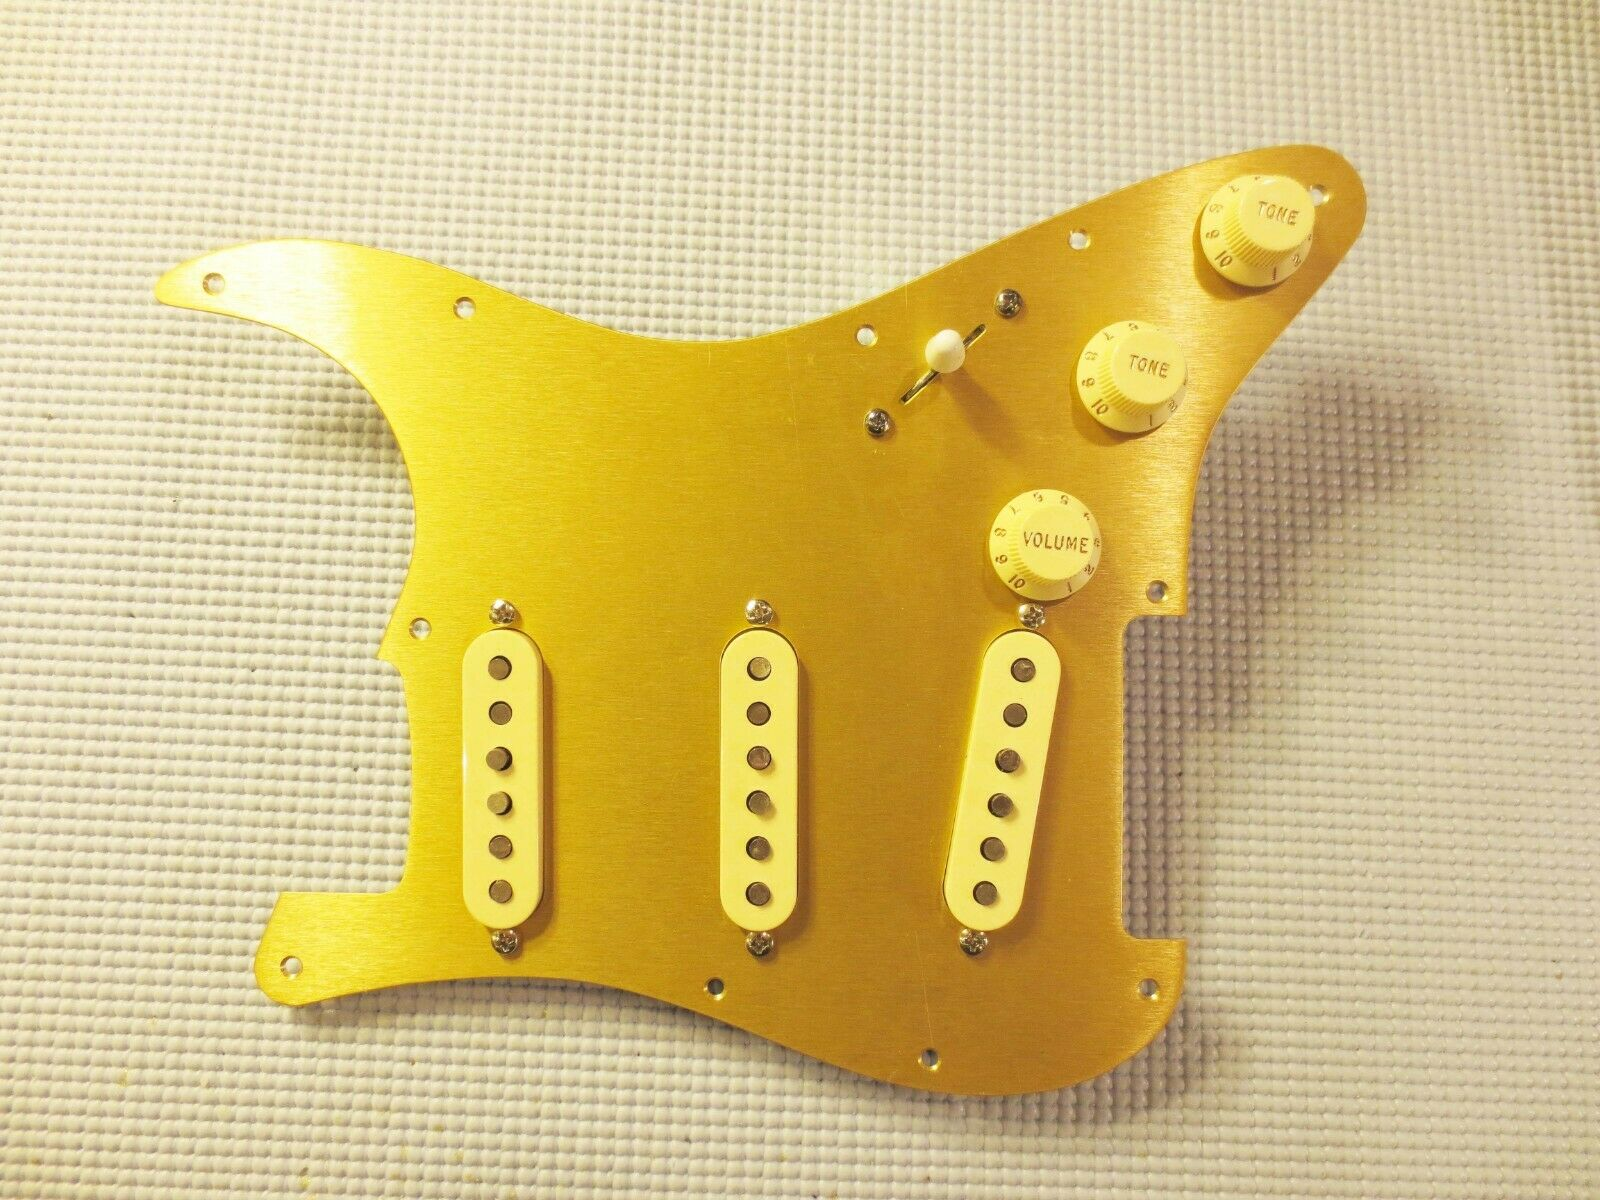 Fender Original 57 62 Pickup geladen Strat Pickguard Age Cream on Gold Anodised